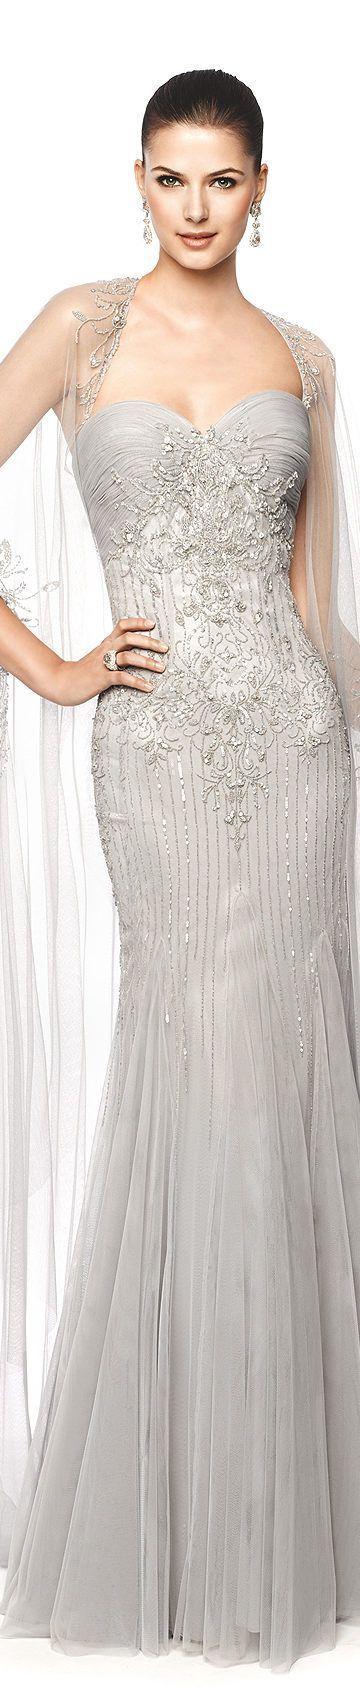 vestido de gala branco